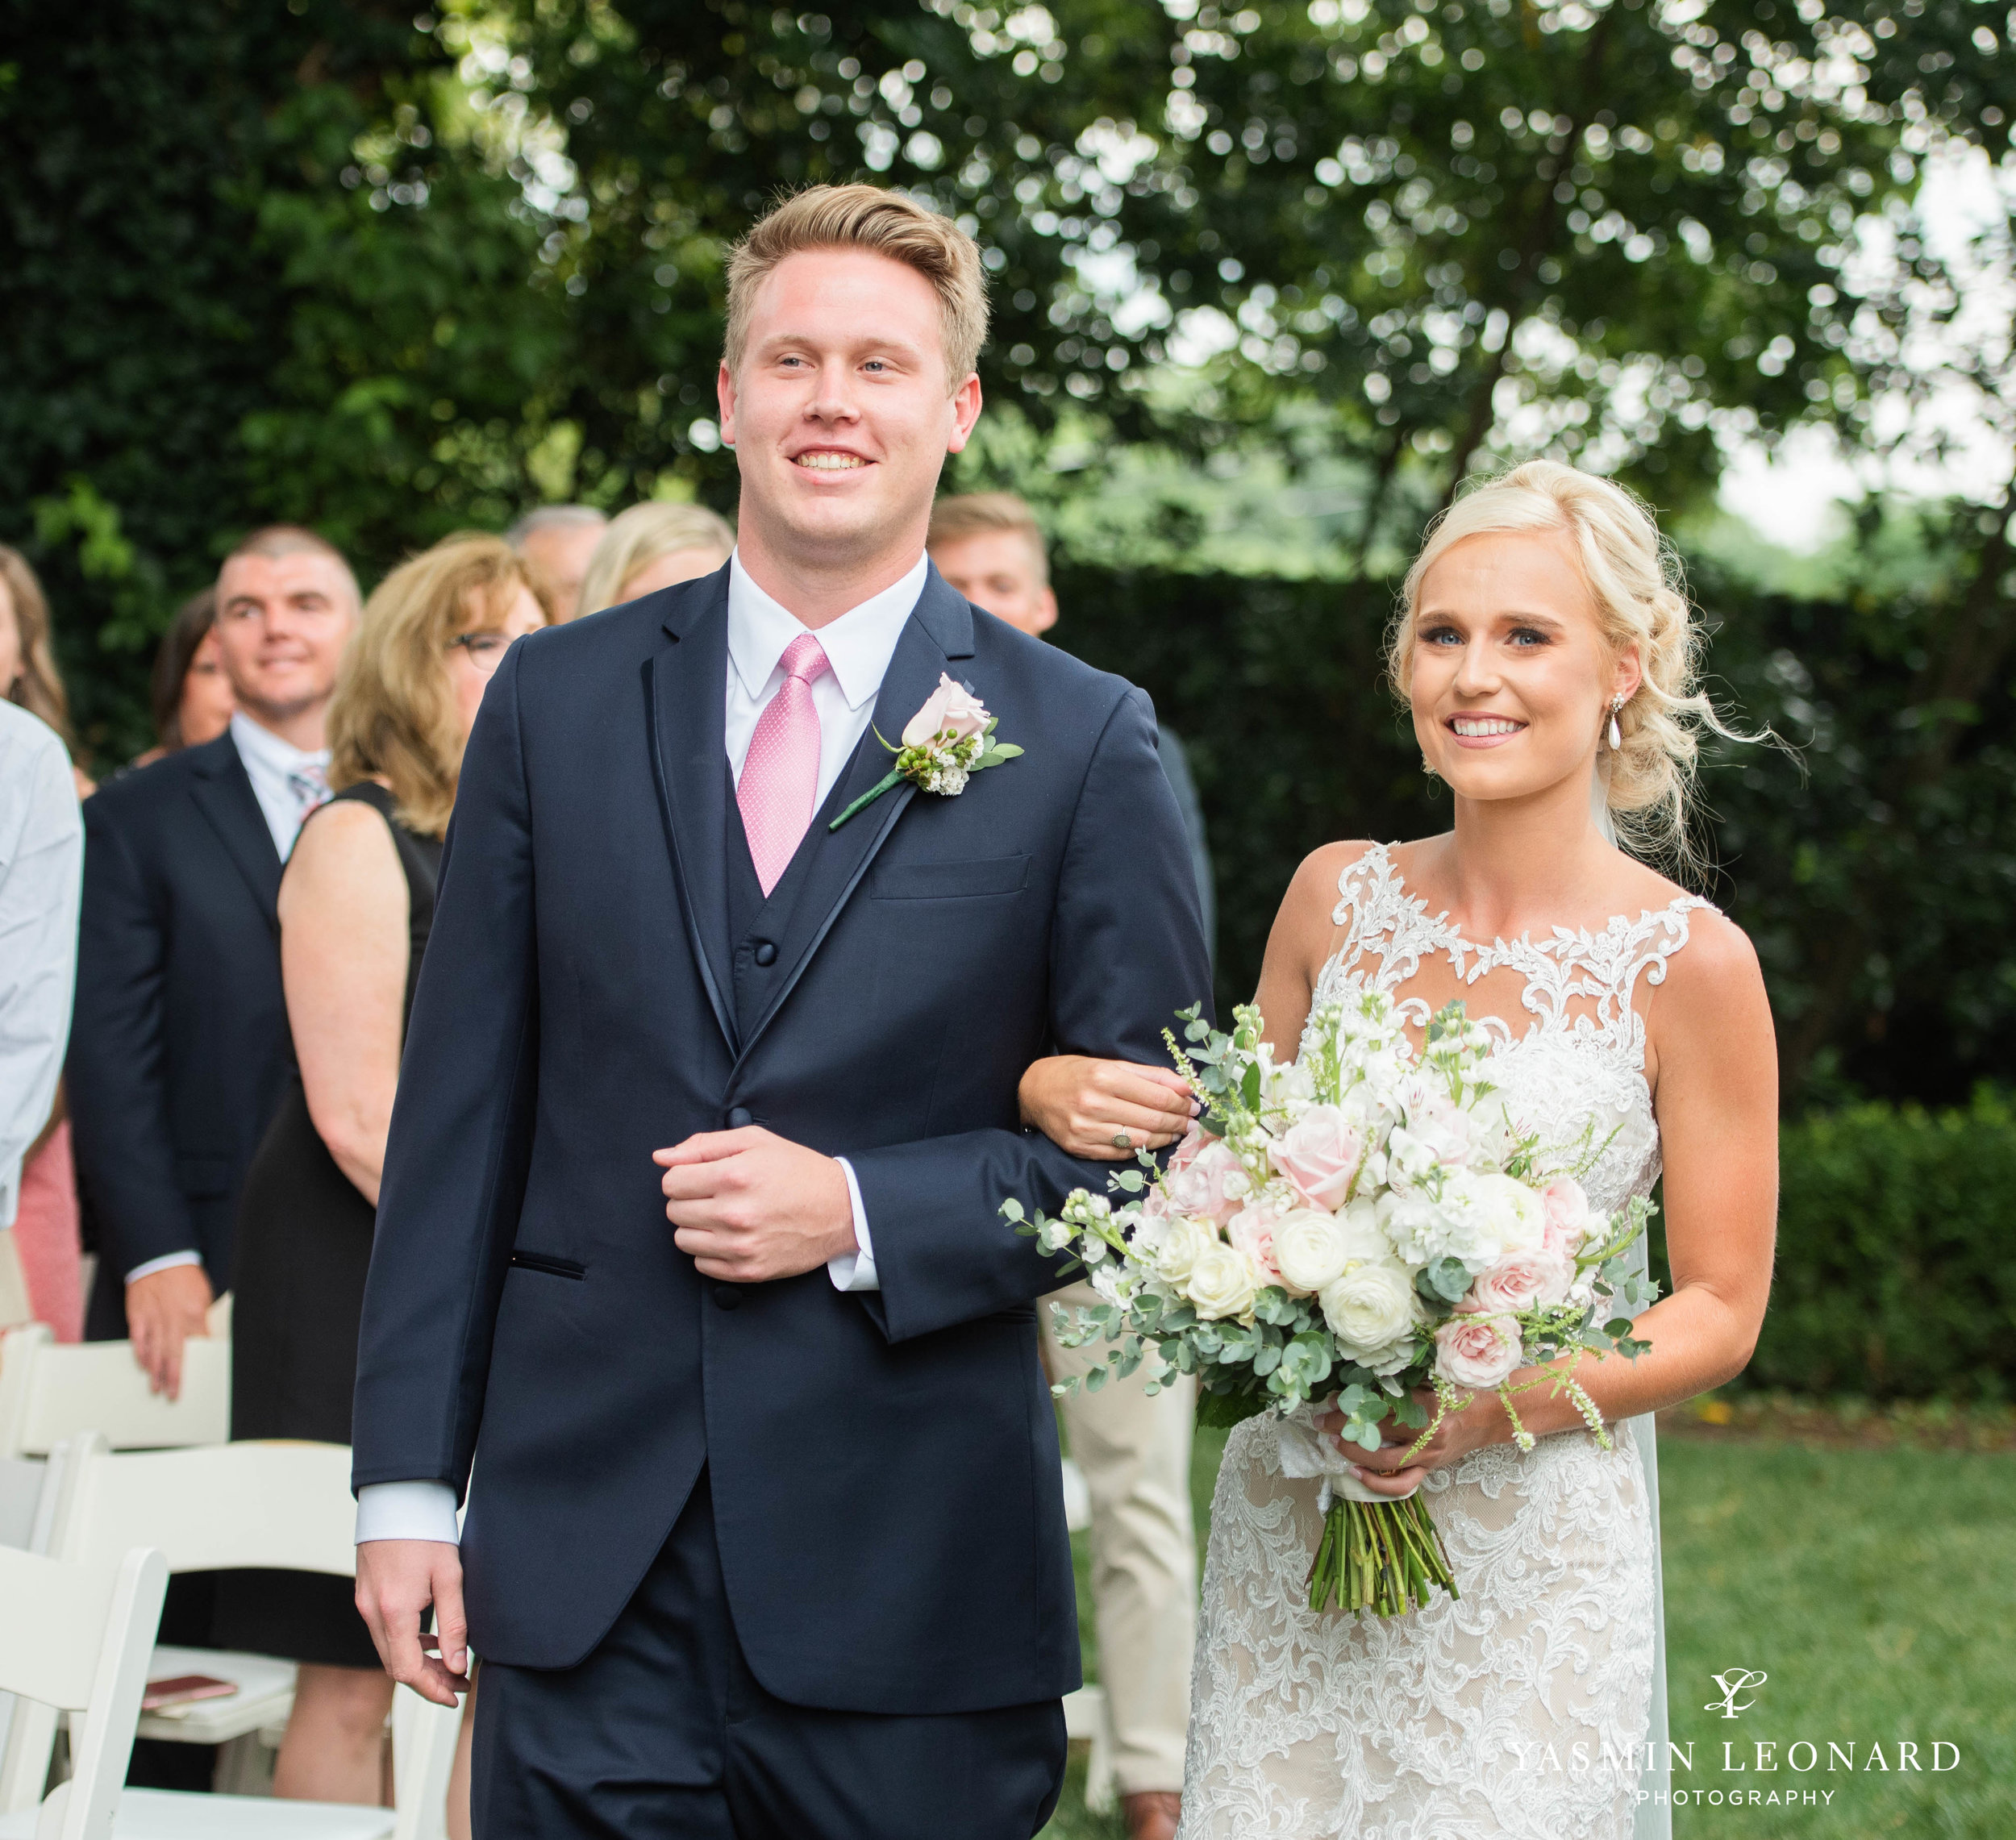 Separk Mansion - NC Weddings - Gastonia Wedding - NC Wedding Venues - Pink and Blue Wedding Ideas - Pink Bridesmaid Dresses - Yasmin Leonard Photography-19.jpg